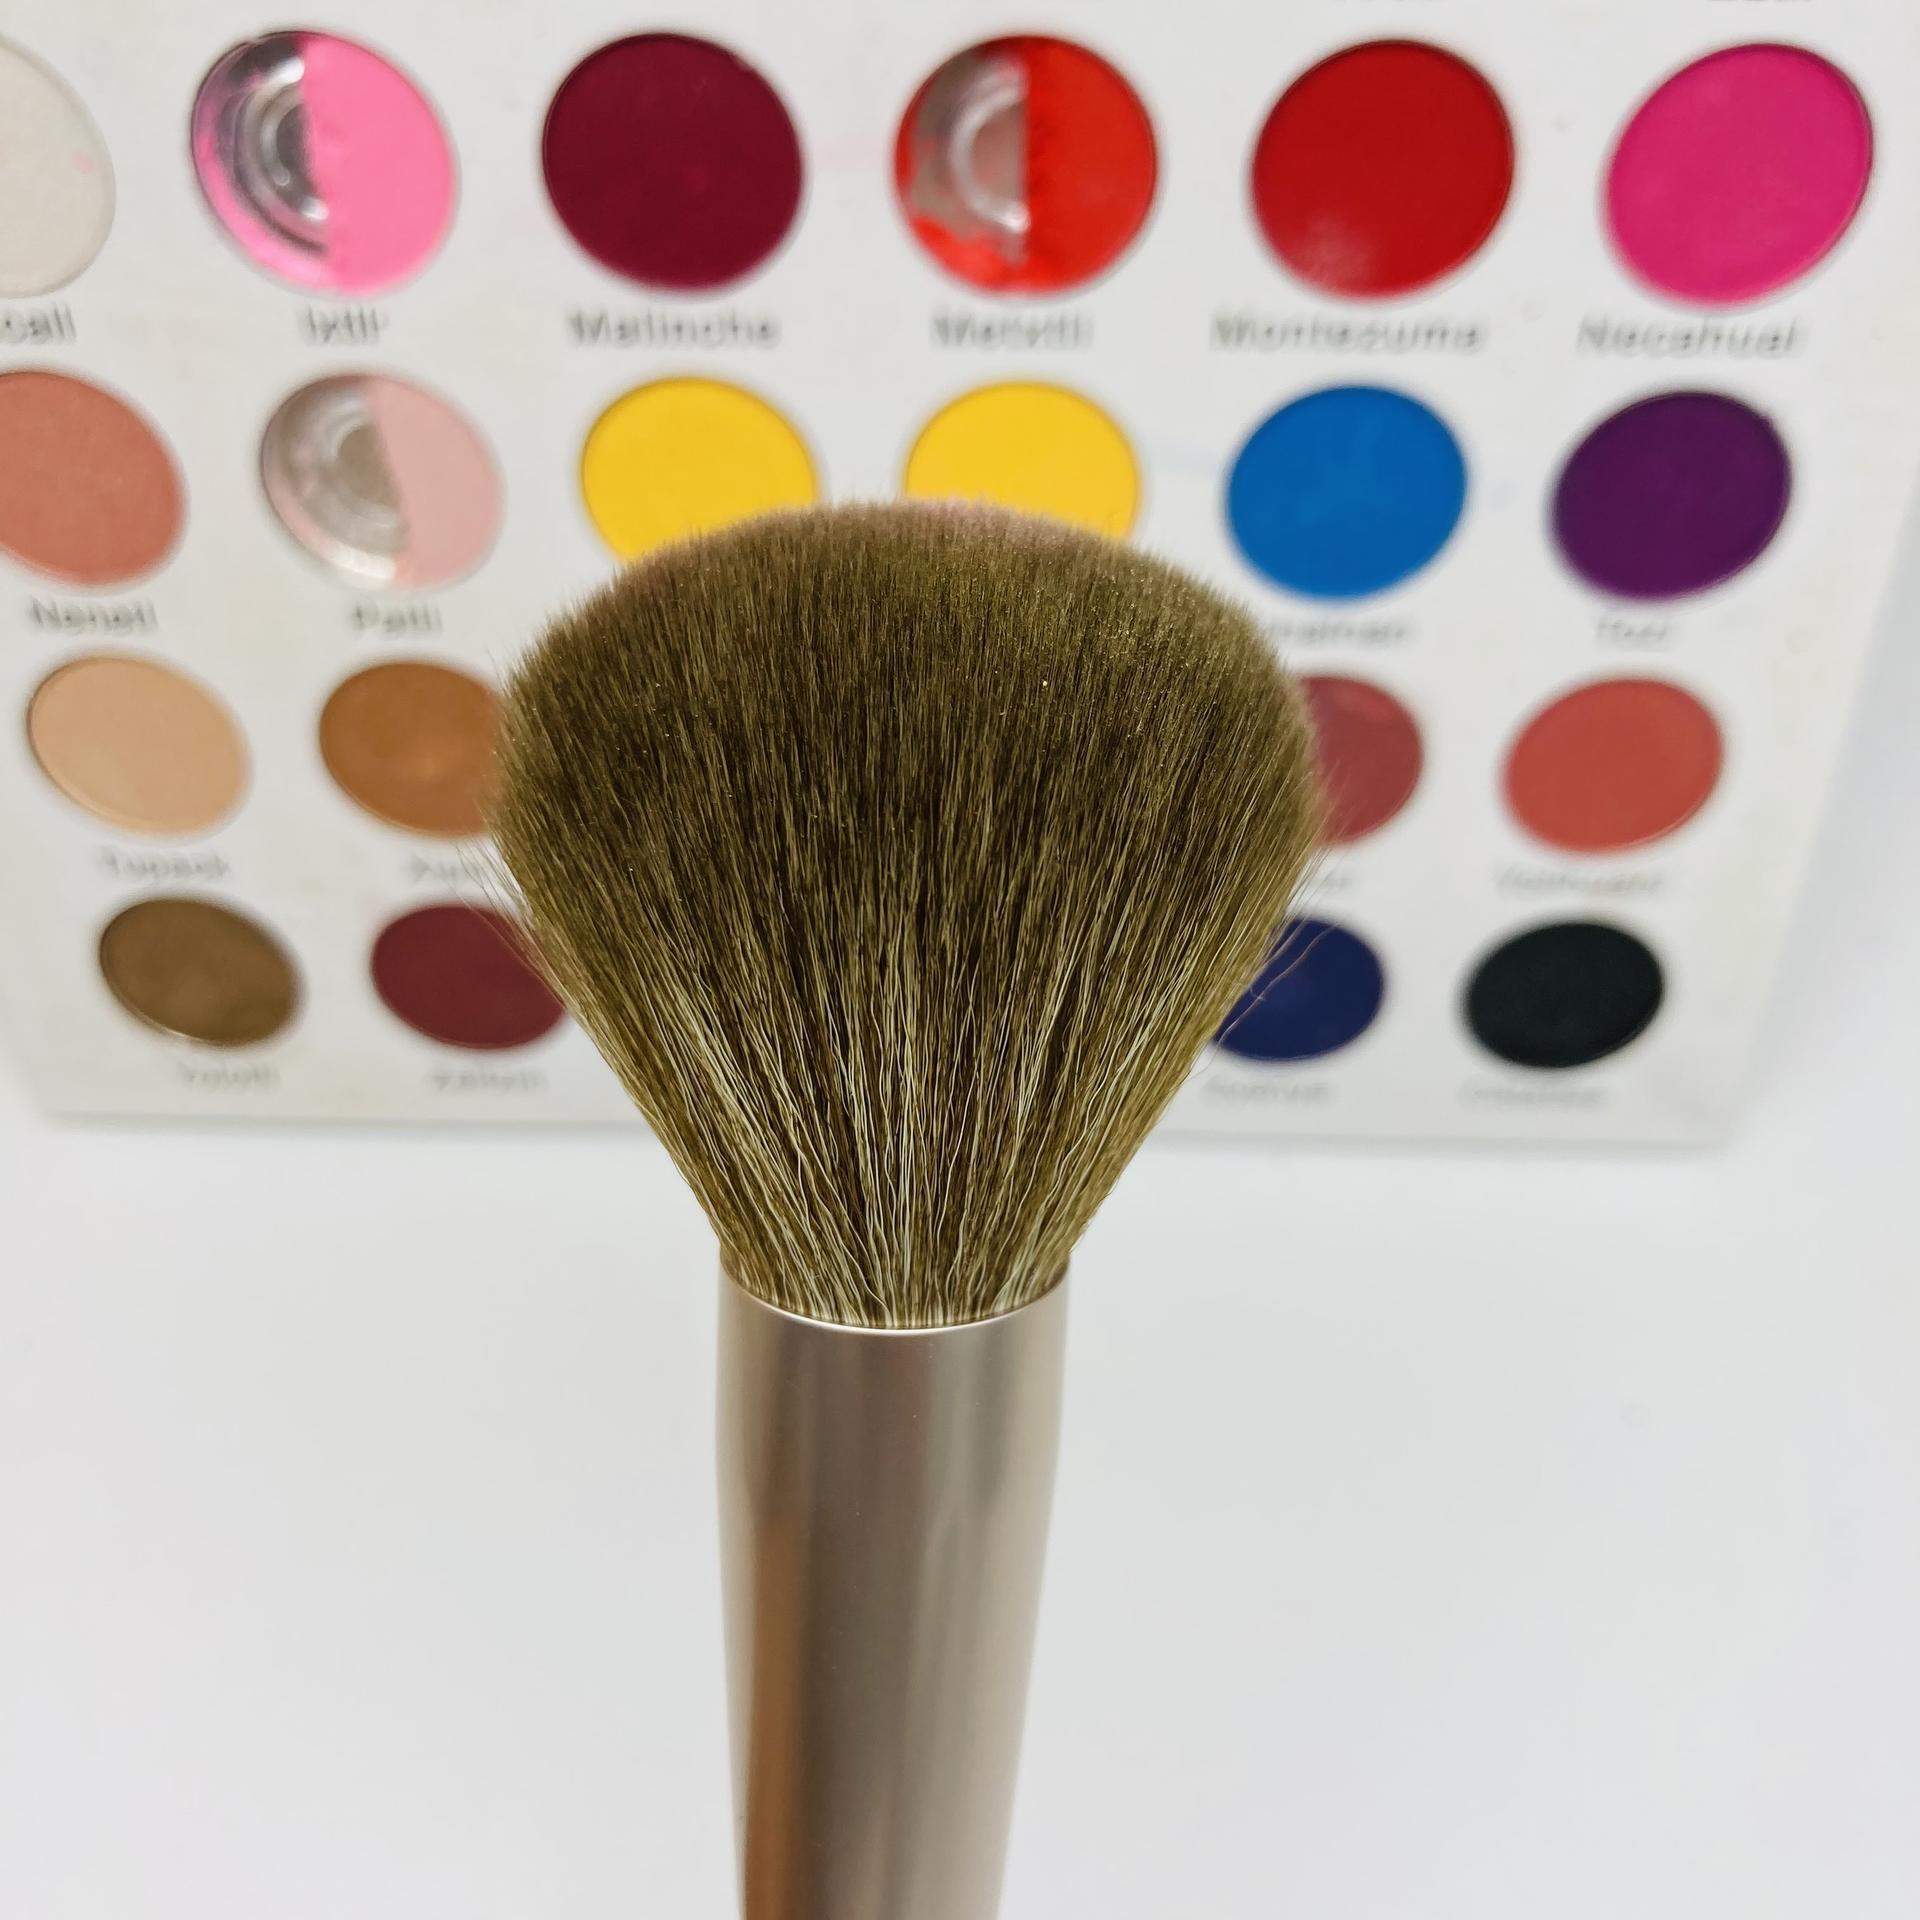 Makeup blending brush ultra-soft loose powder brush premium synthetic cashmere natural hair makeup brush